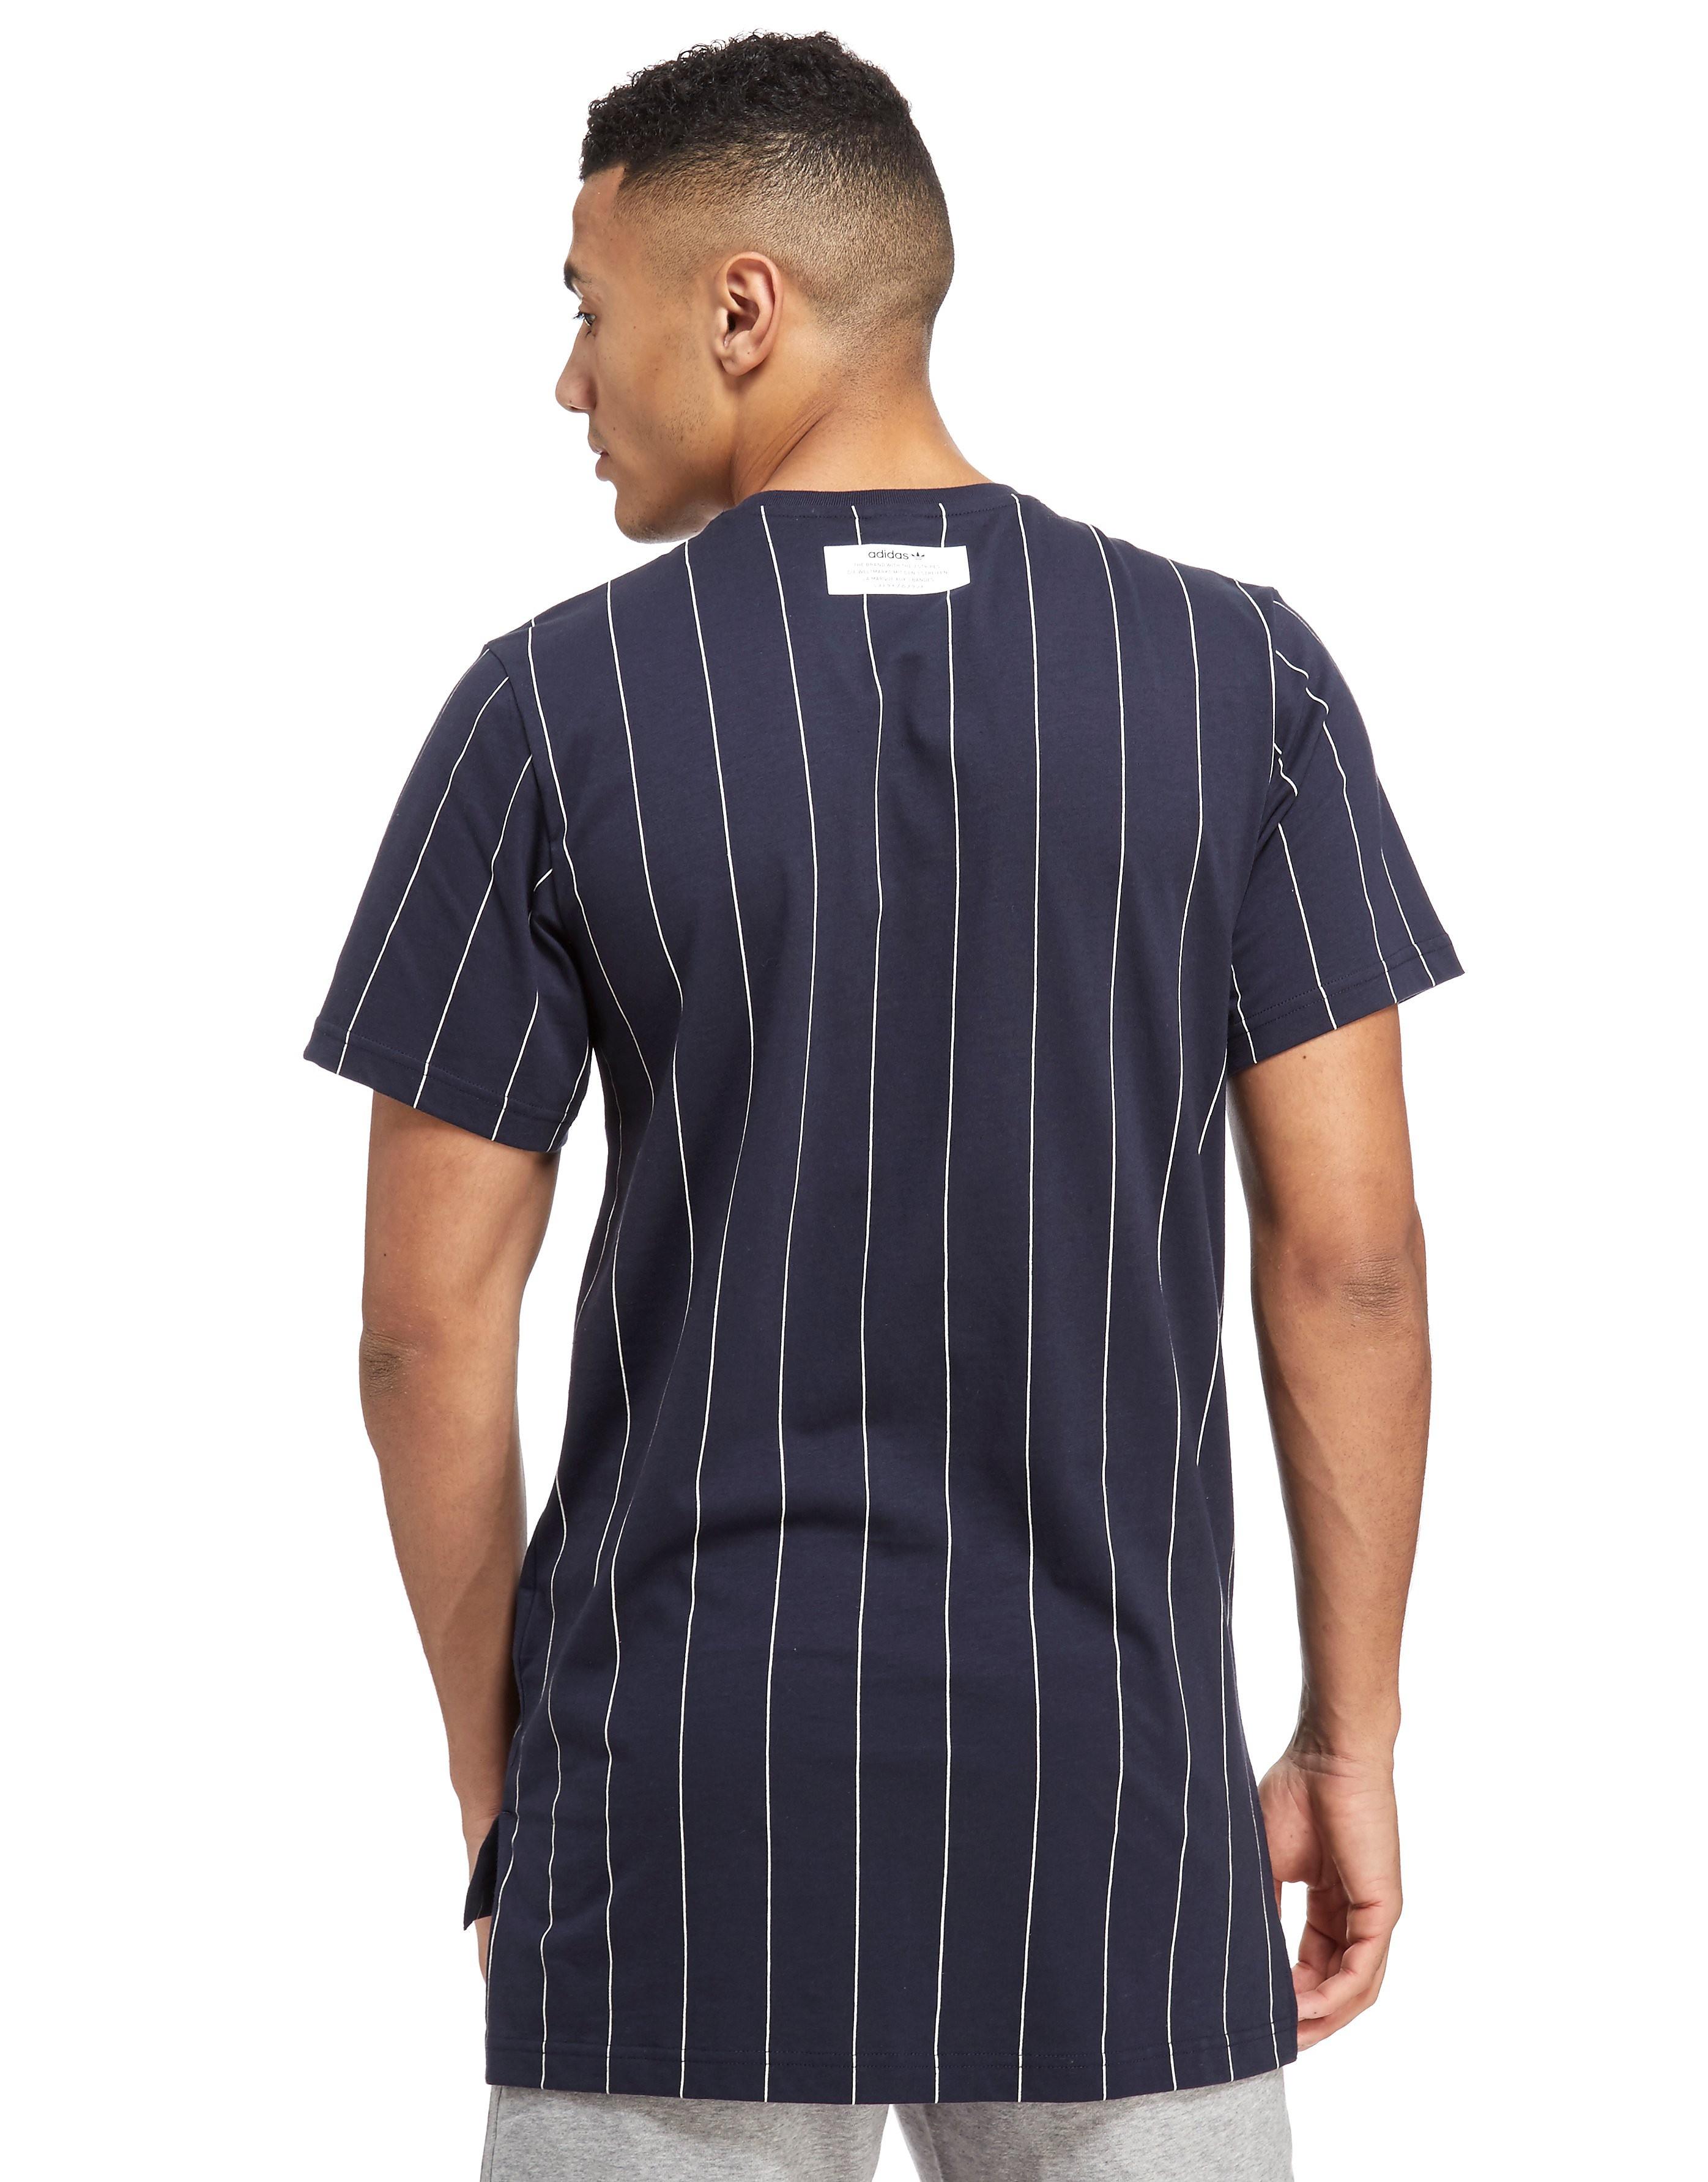 adidas Originals Tokyo Pinstripe T-Shirt